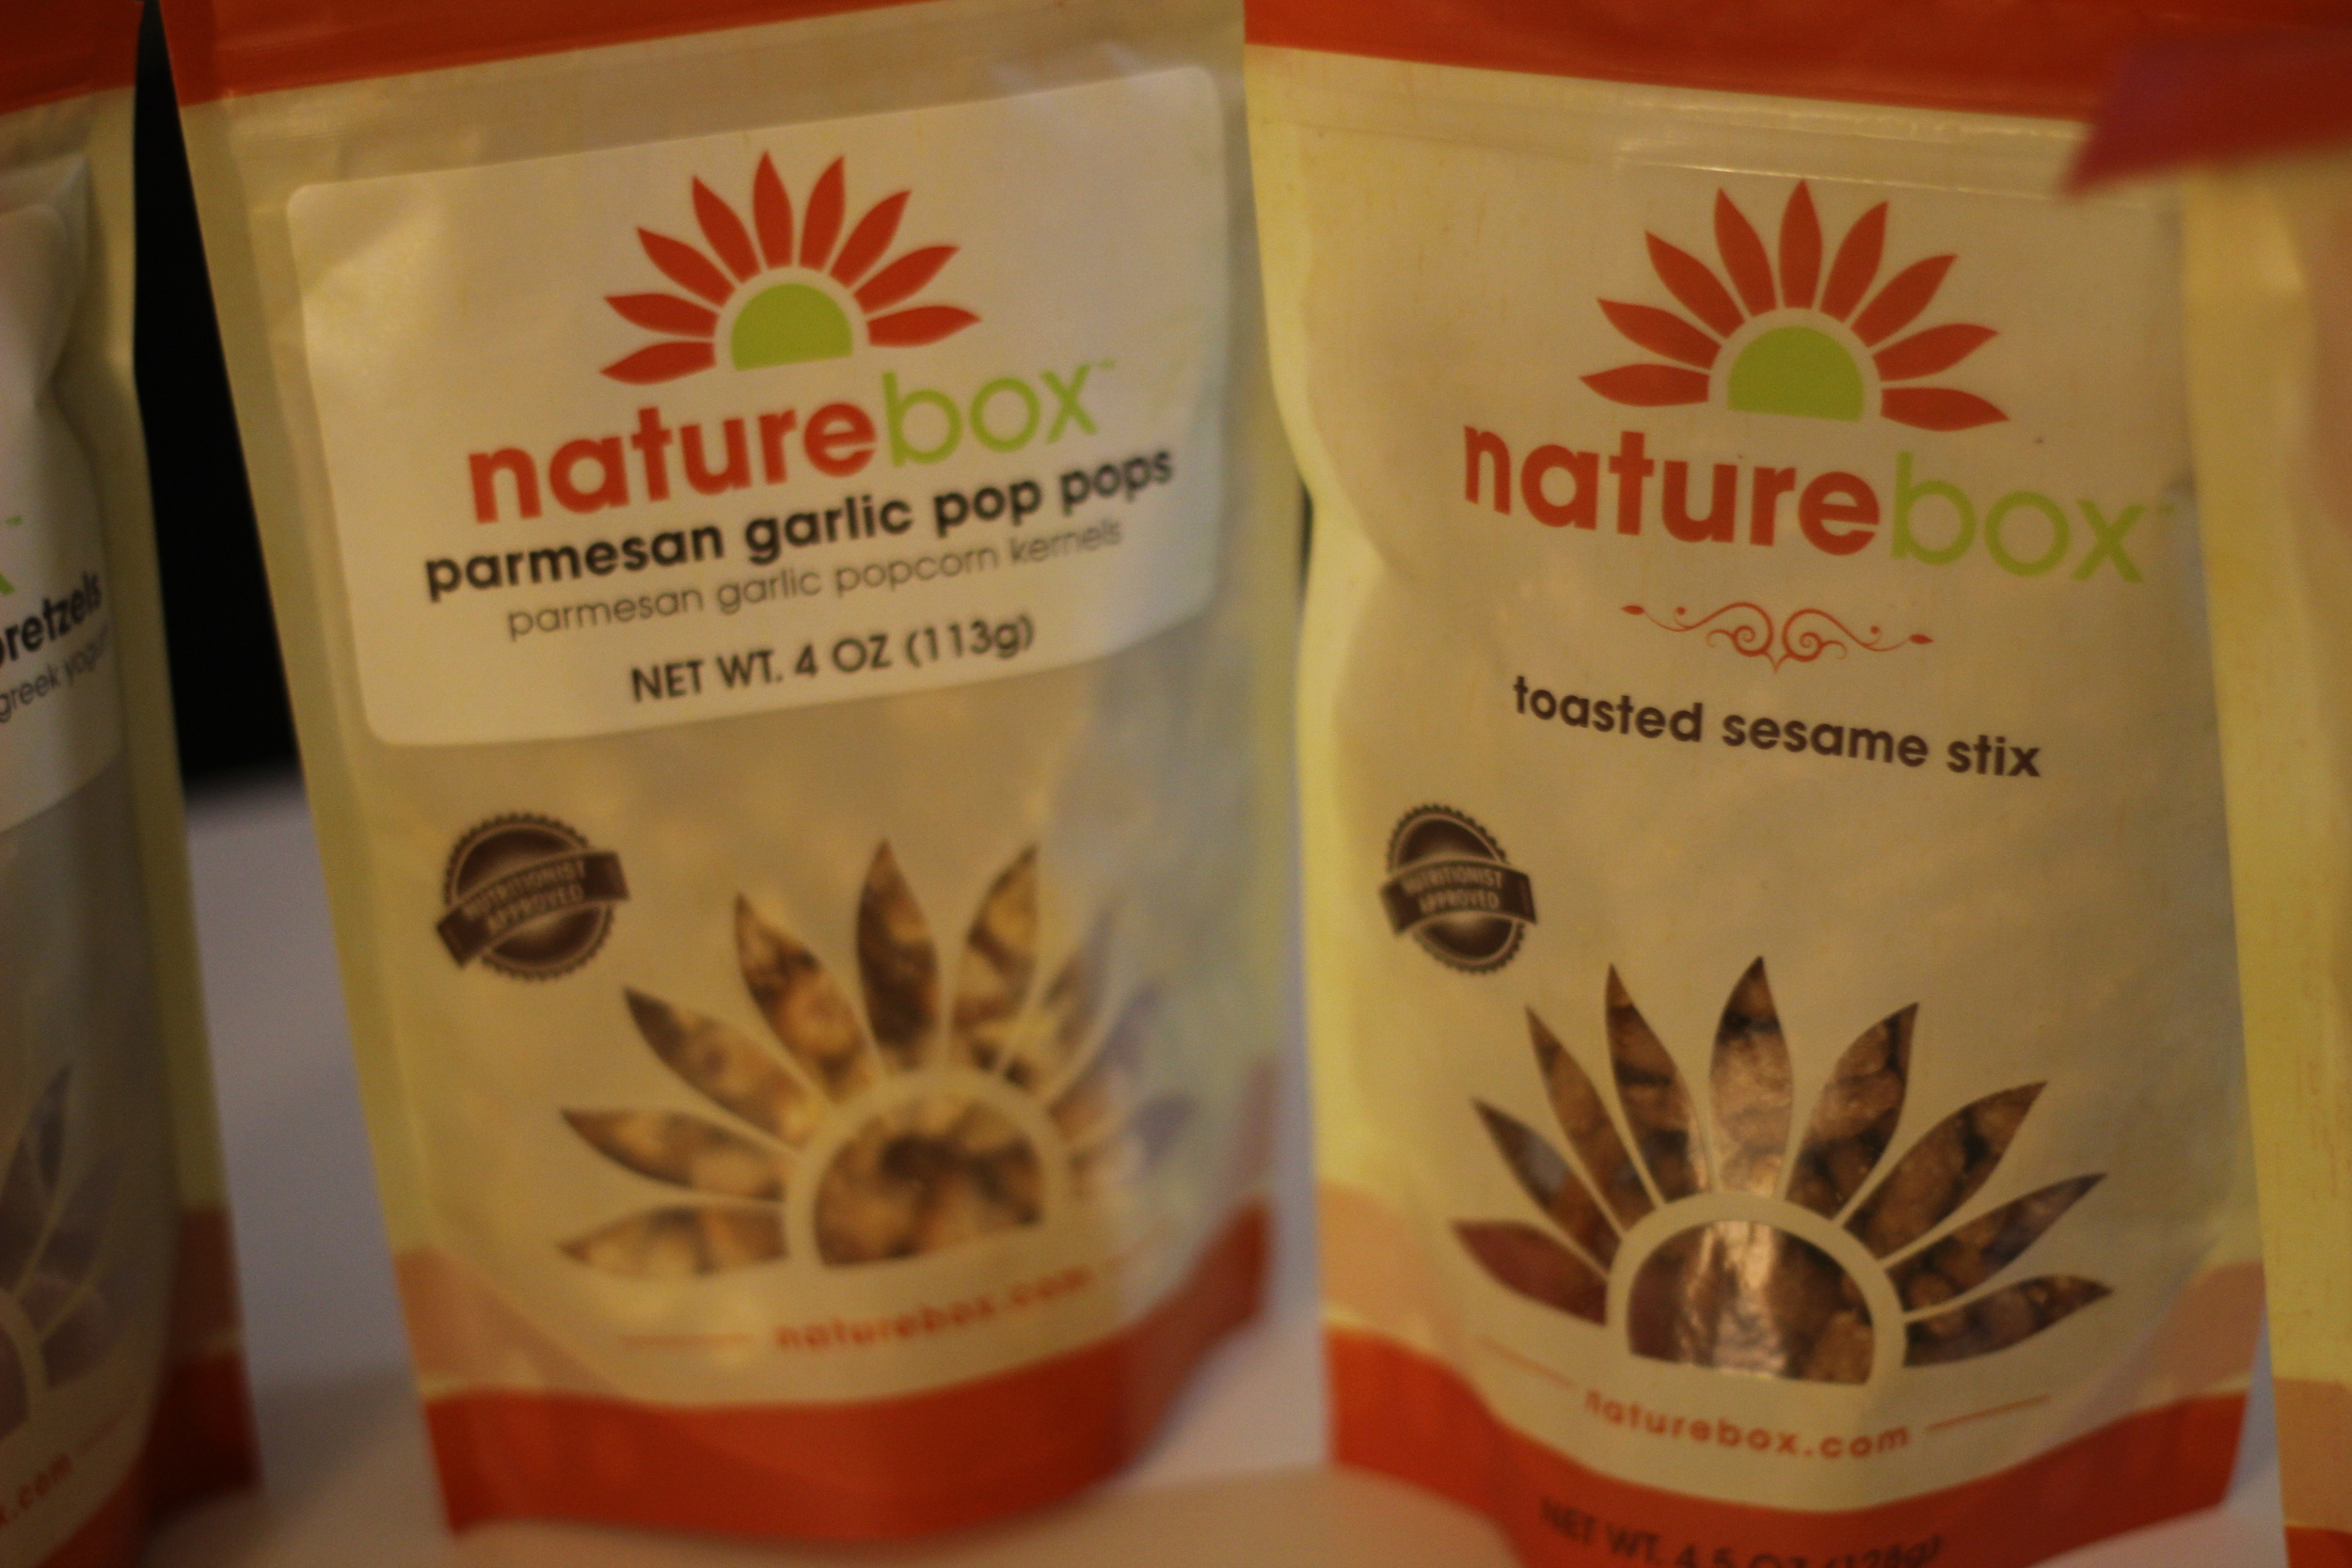 Naturebox Parmesan Garlic Pop Pops and Toasted Sesame Stix